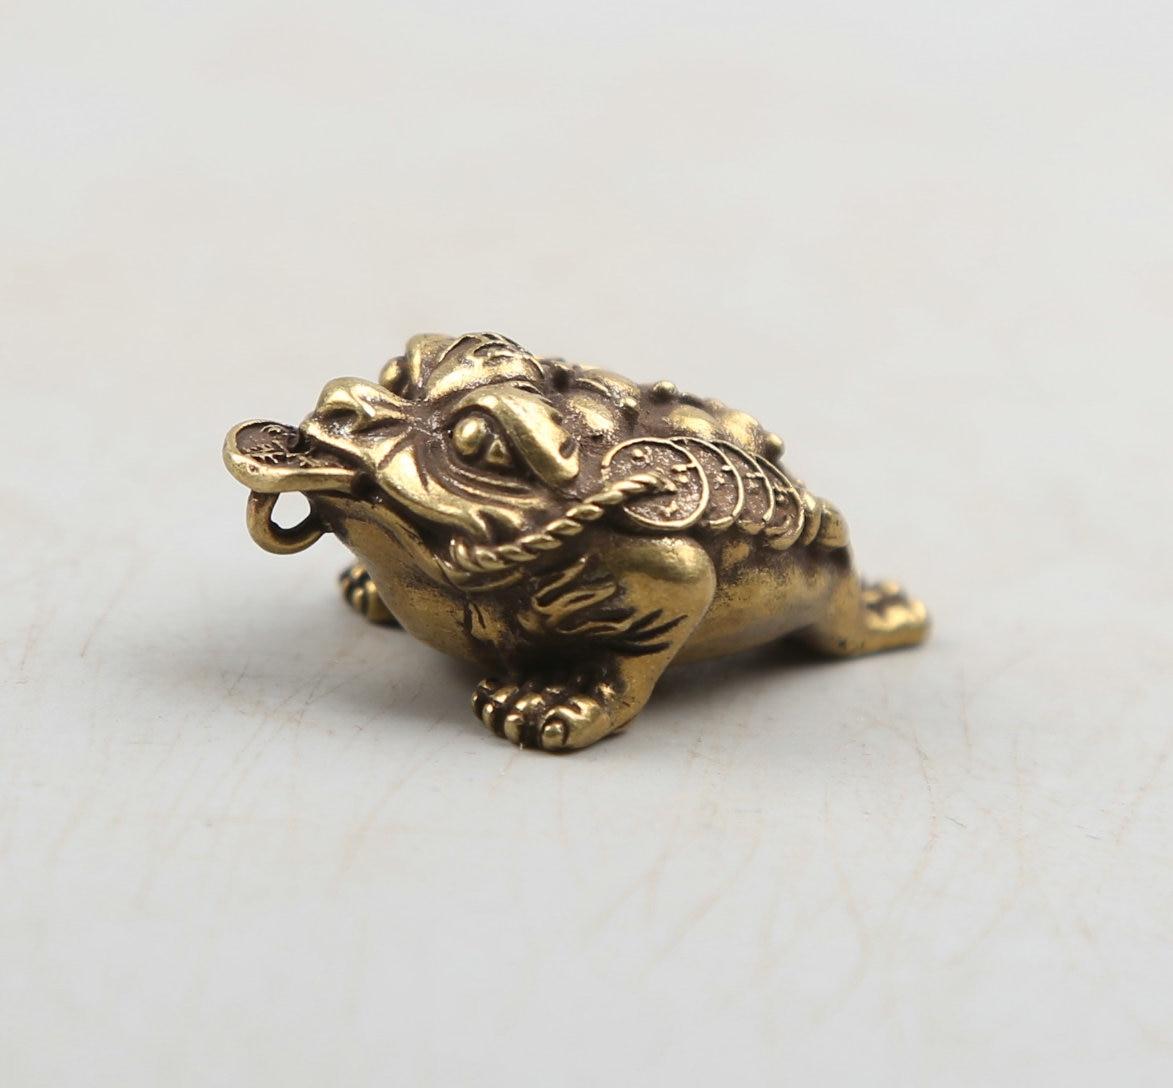 "37MM/1,5 ""recoger Curio raro BRONCE DE Fengshui chino exquisito Animal dinero Golden Xenopus Toad riqueza colgante estatua Statuary30g"